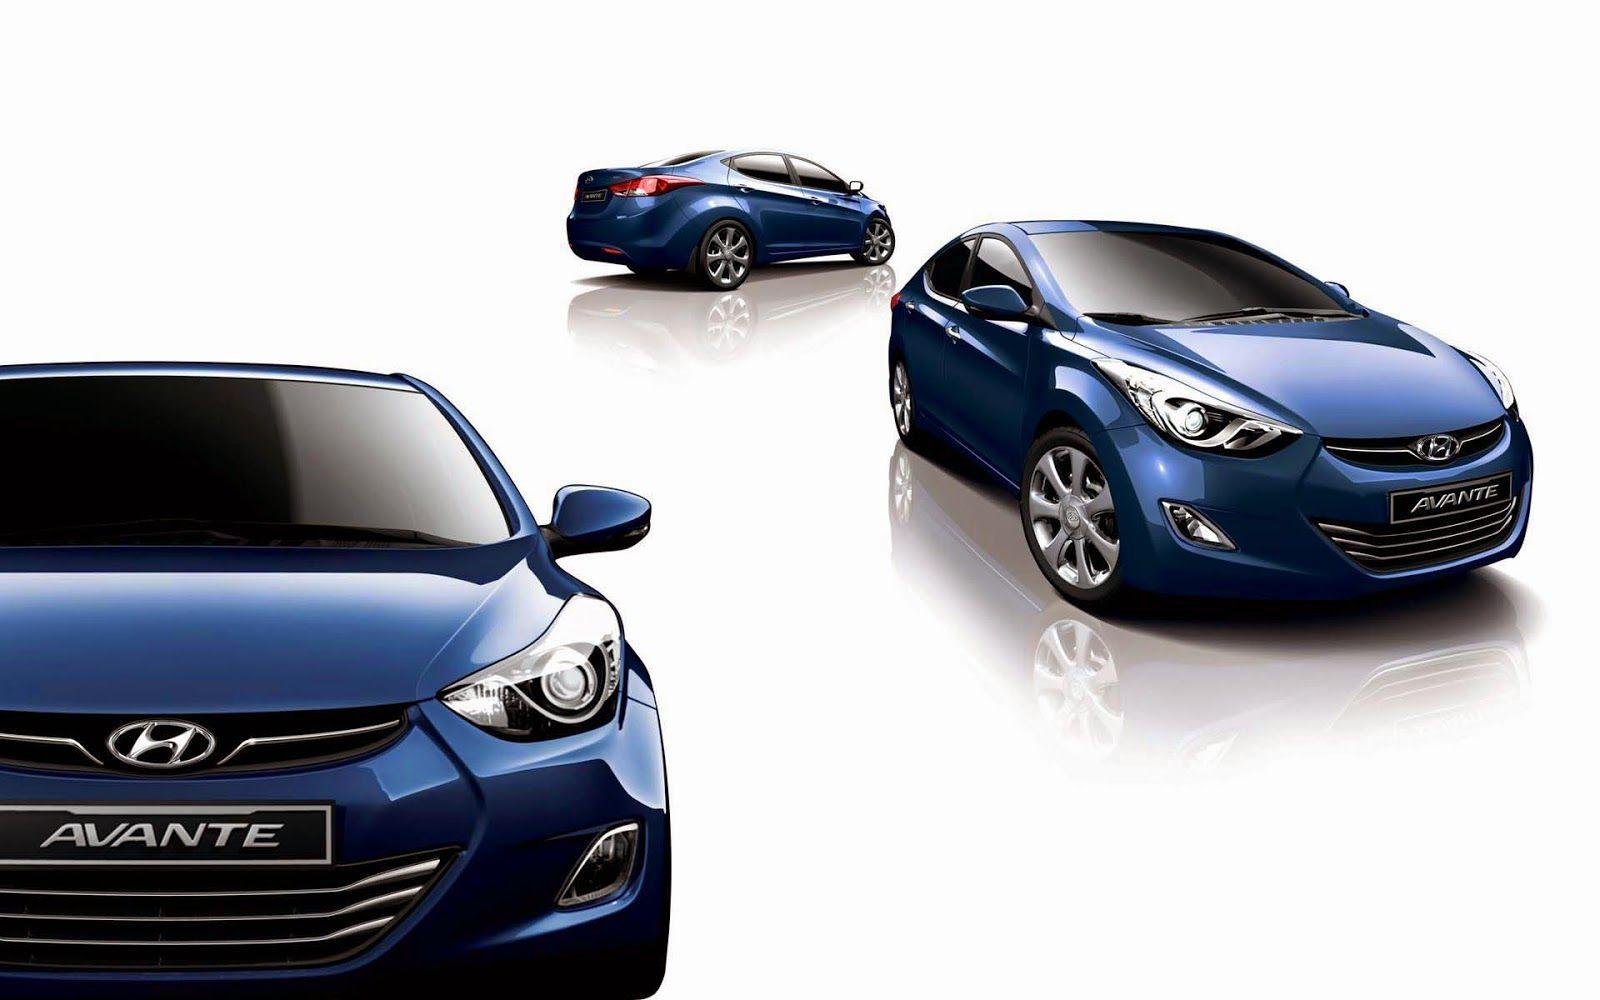 2011 Hyundai Avante Elantra Free Wallpaper Auto Cars